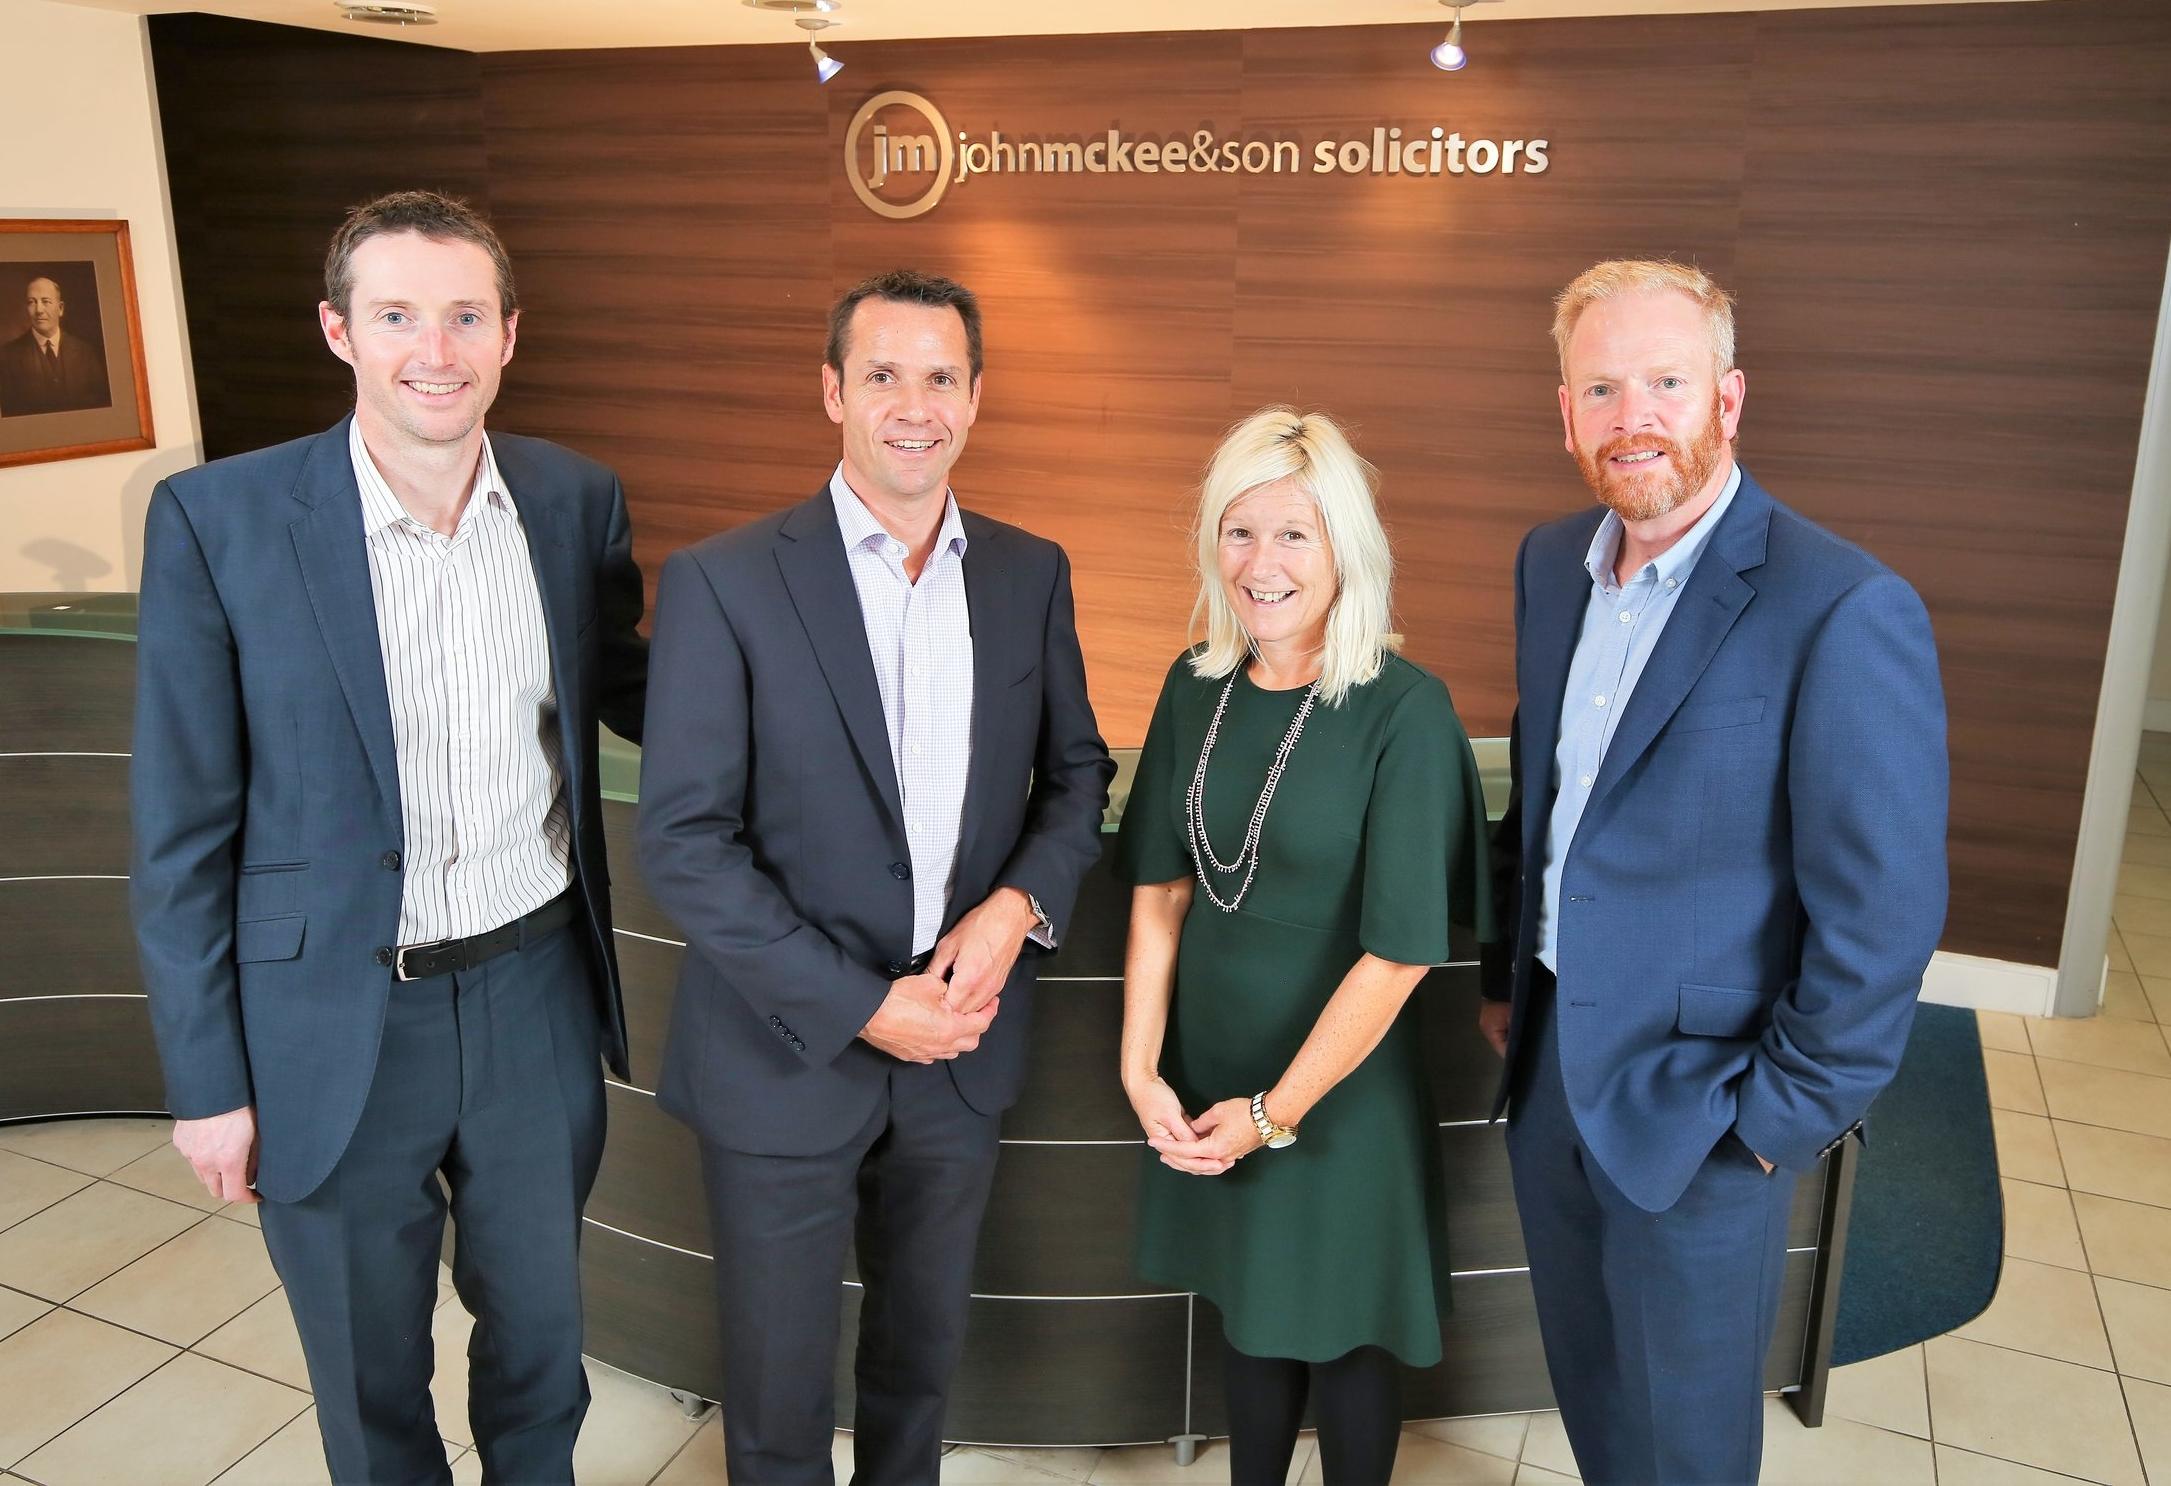 Members of the John McKee Solicitors energy team Philip McBride, Chris Ross, Andrea McCann and Alan Bissett.